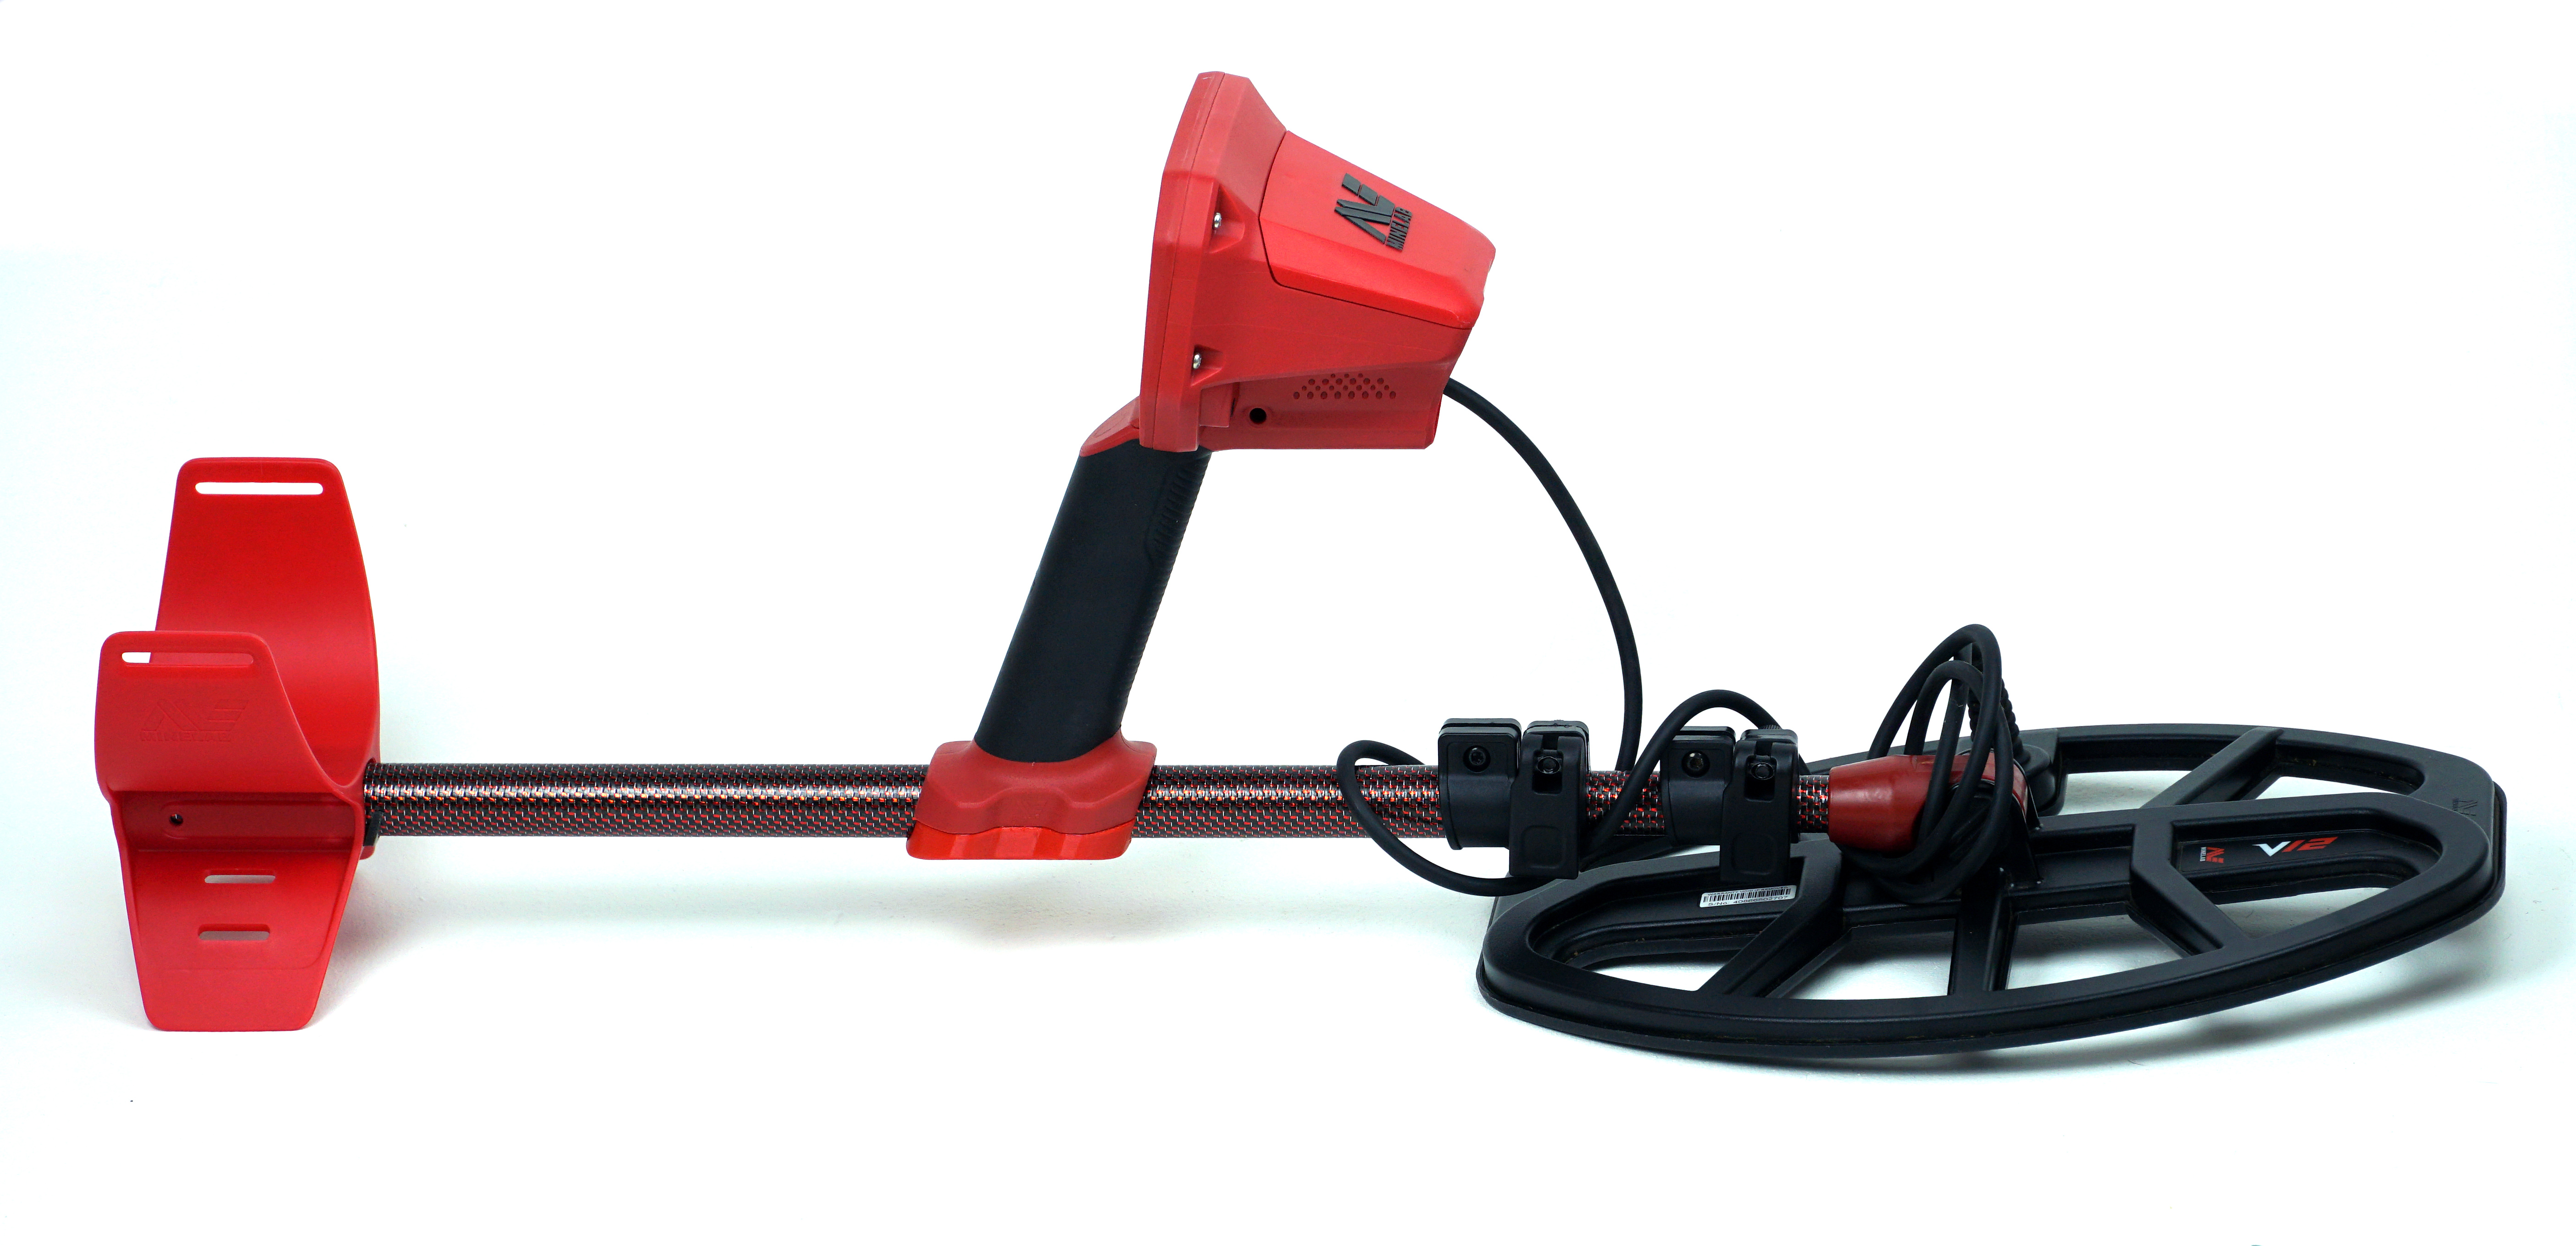 Vanquish 540 on a Tele-Knox Stem